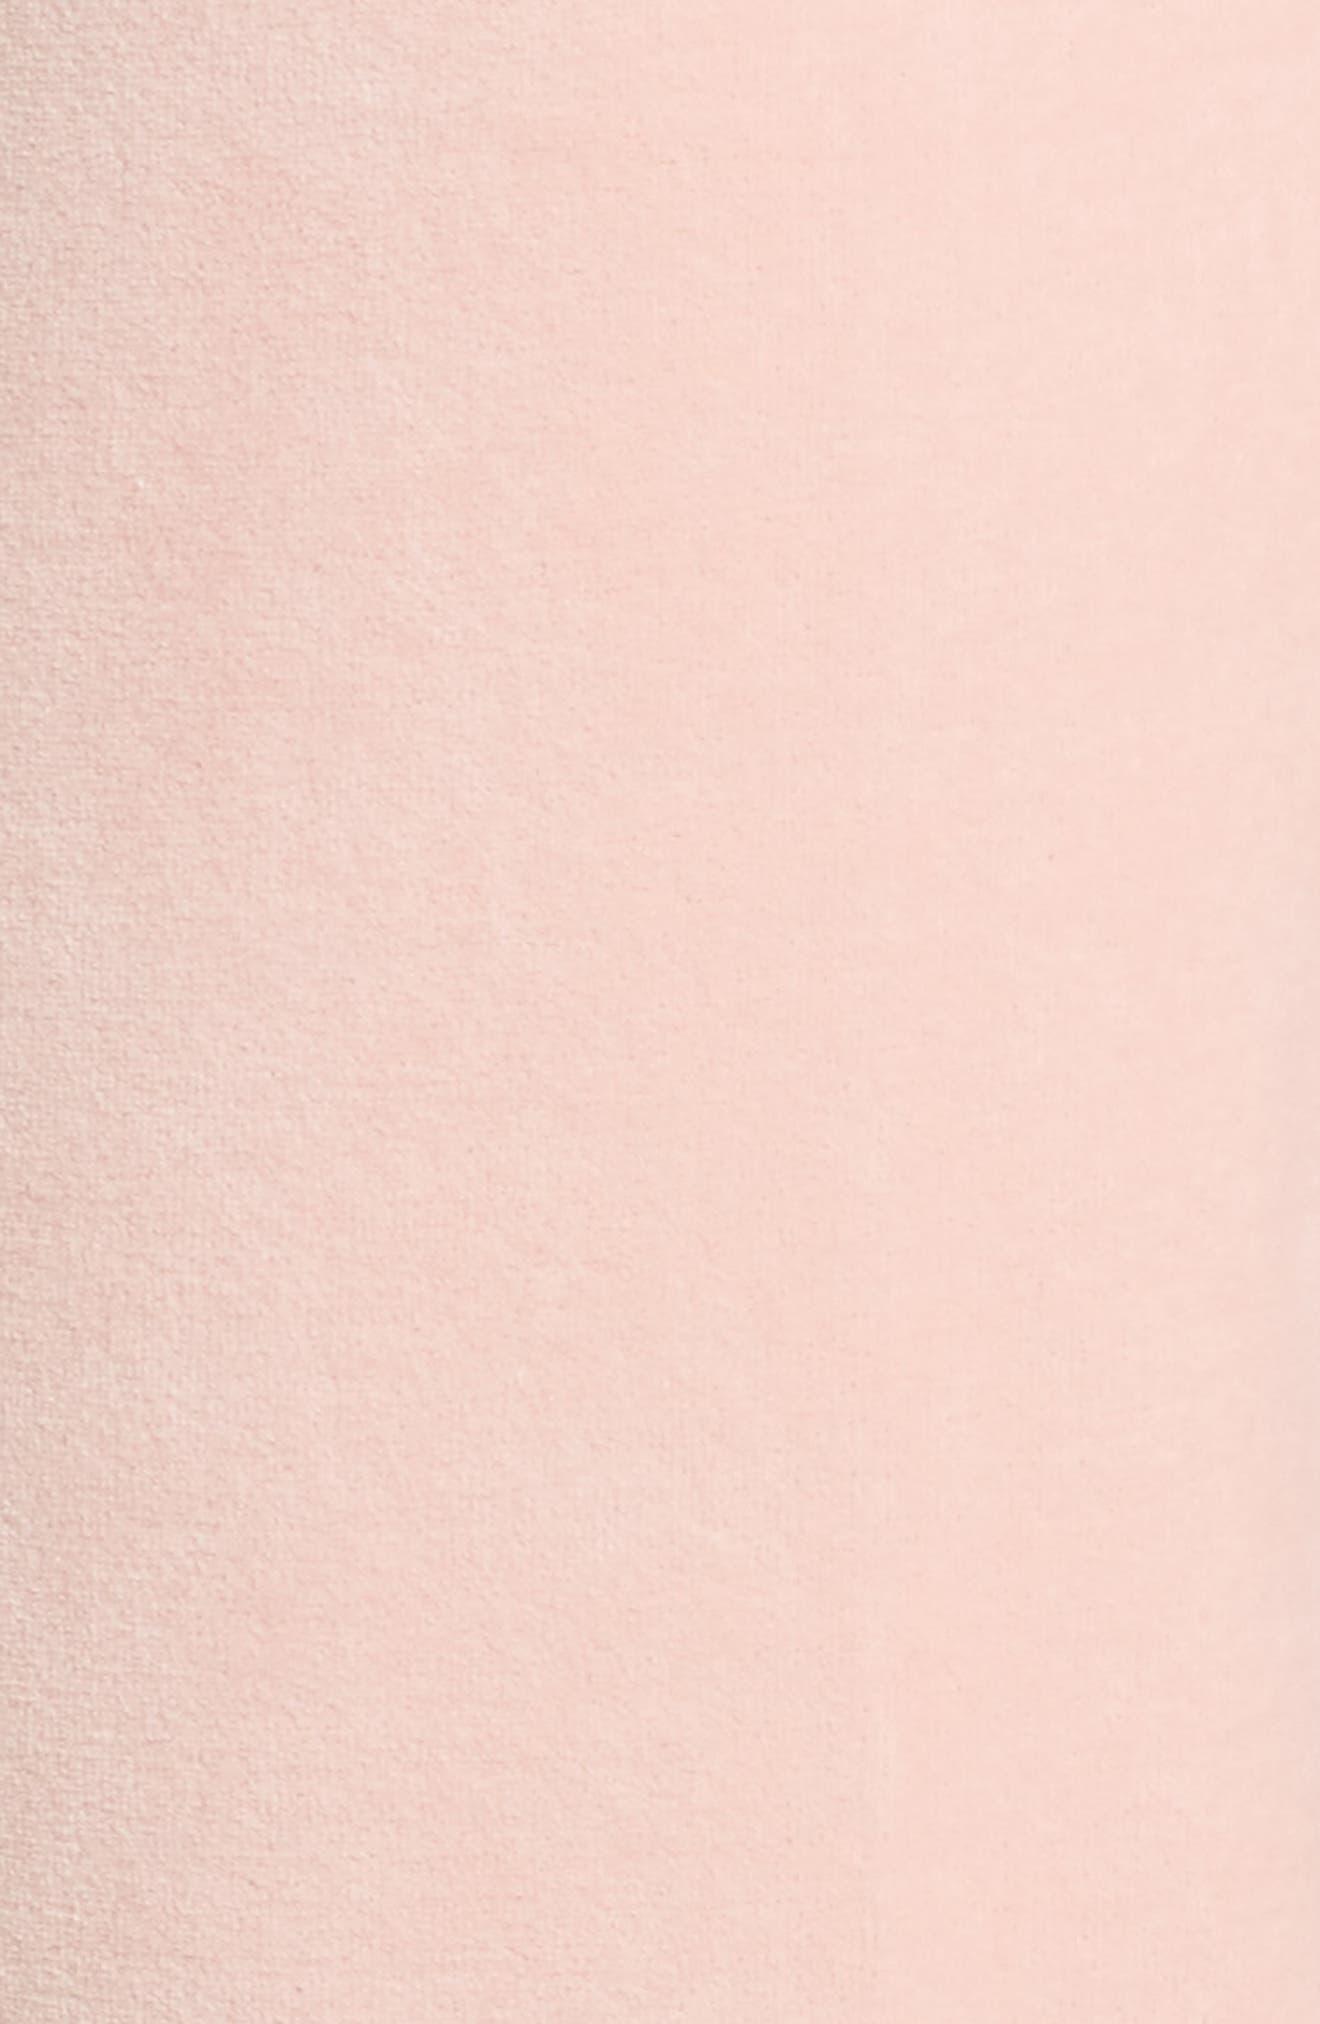 Zuma Crystal Velour Pants,                             Alternate thumbnail 5, color,                             Sugared Icing